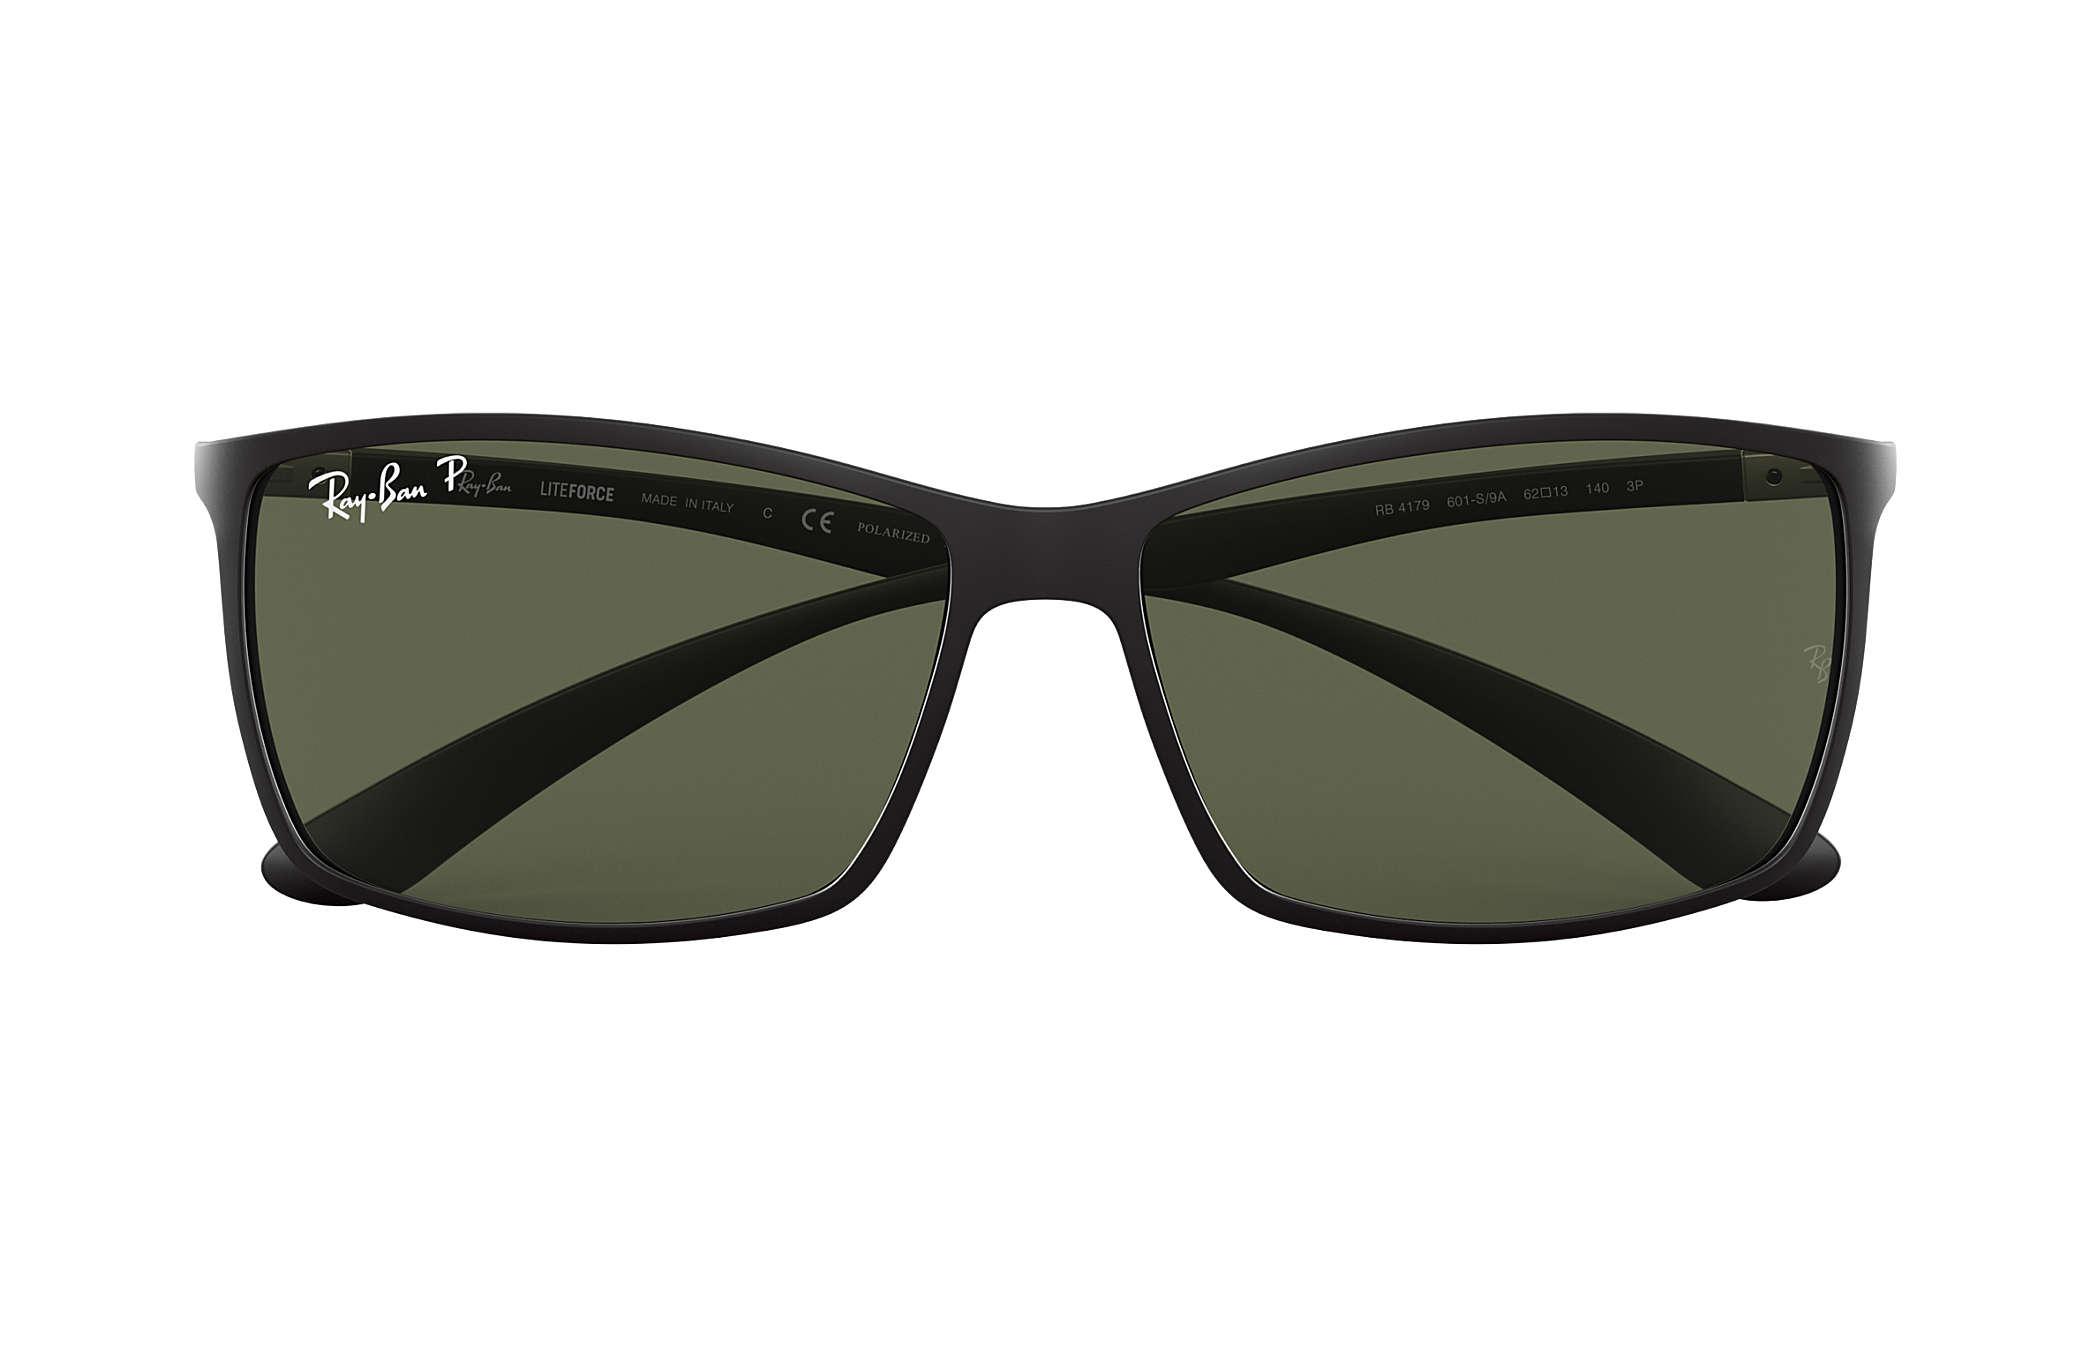 551b6d0394 Ray-Ban RB4179 Black - Liteforce - Green Polarized Lenses ...